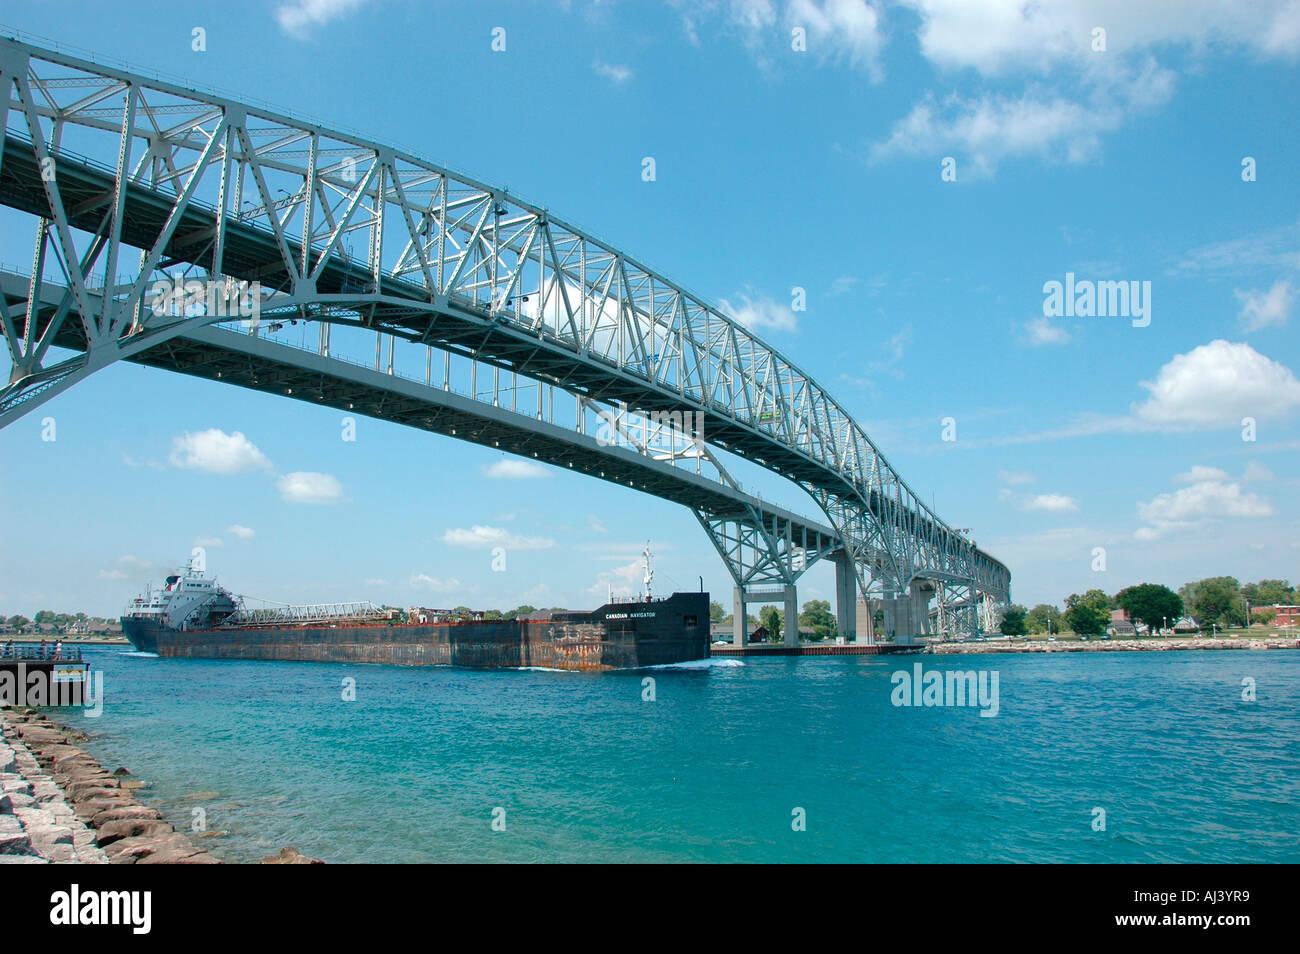 Great Lakes Bulk Ship Going North In Lake Huron At Port